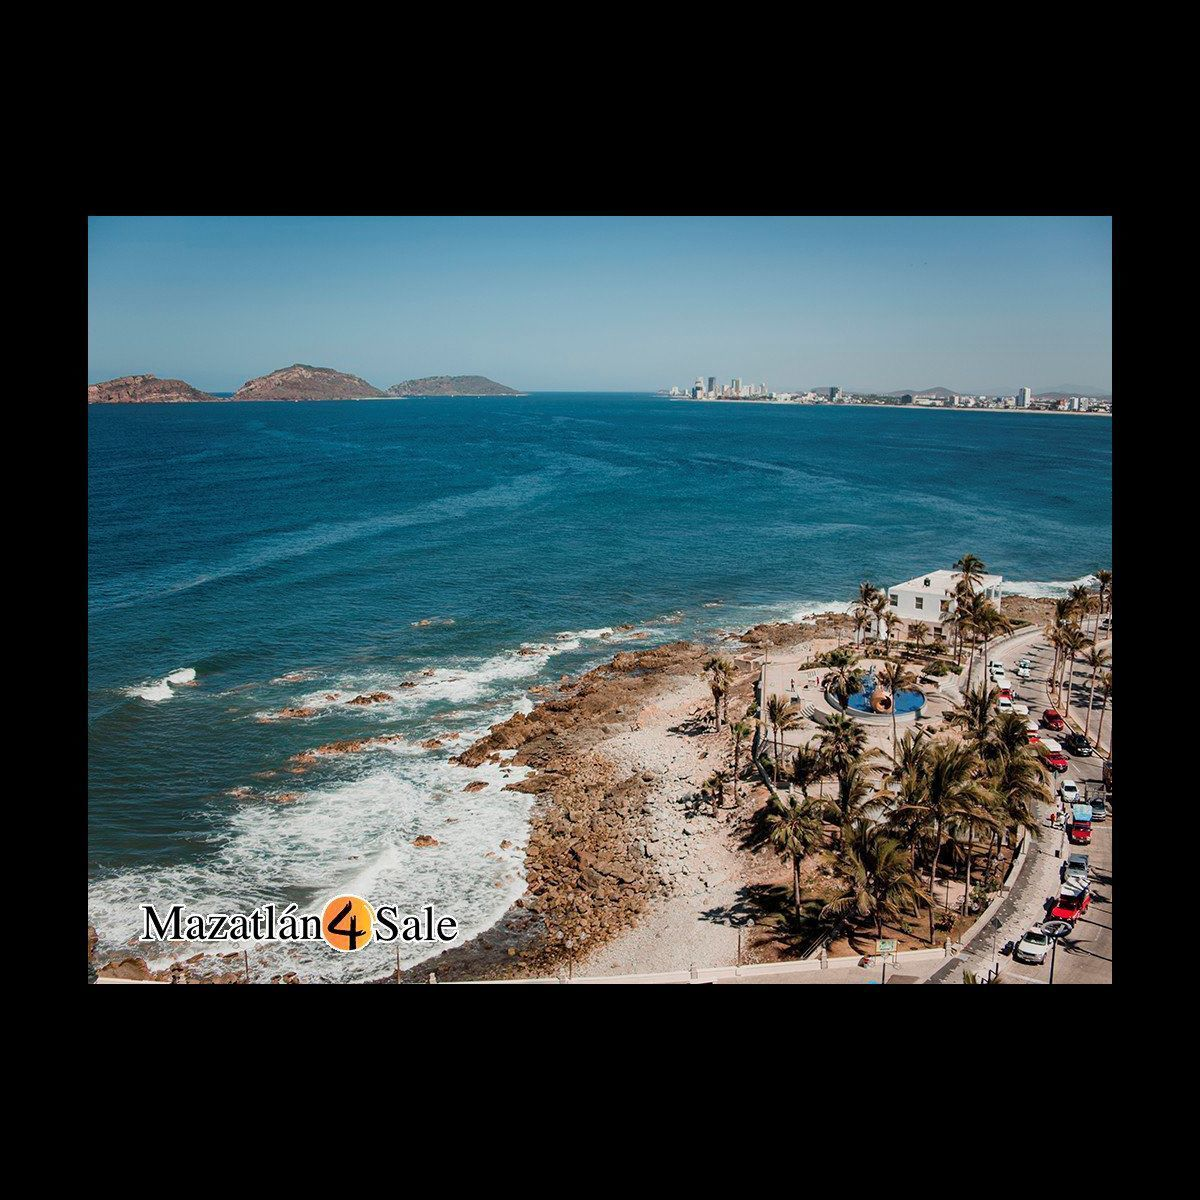 19 de 25: Vista de Mazatlan